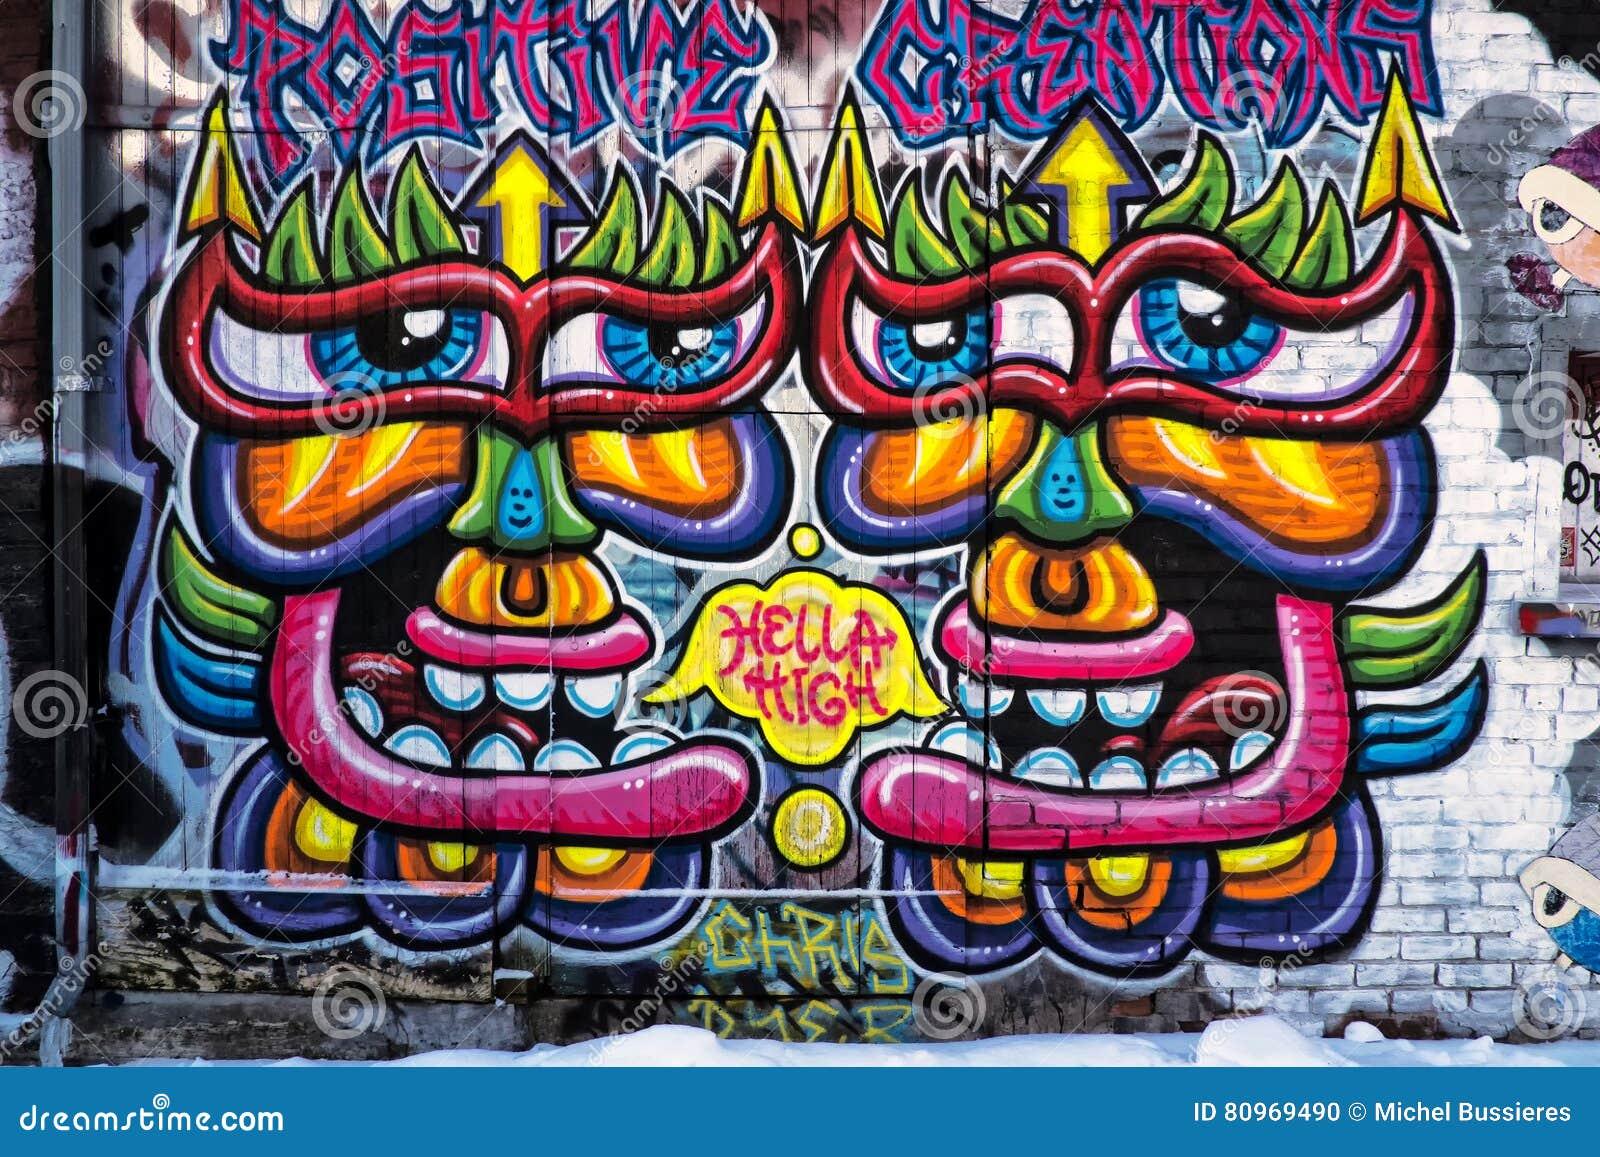 Best Spray Paint For Graffiti Canada